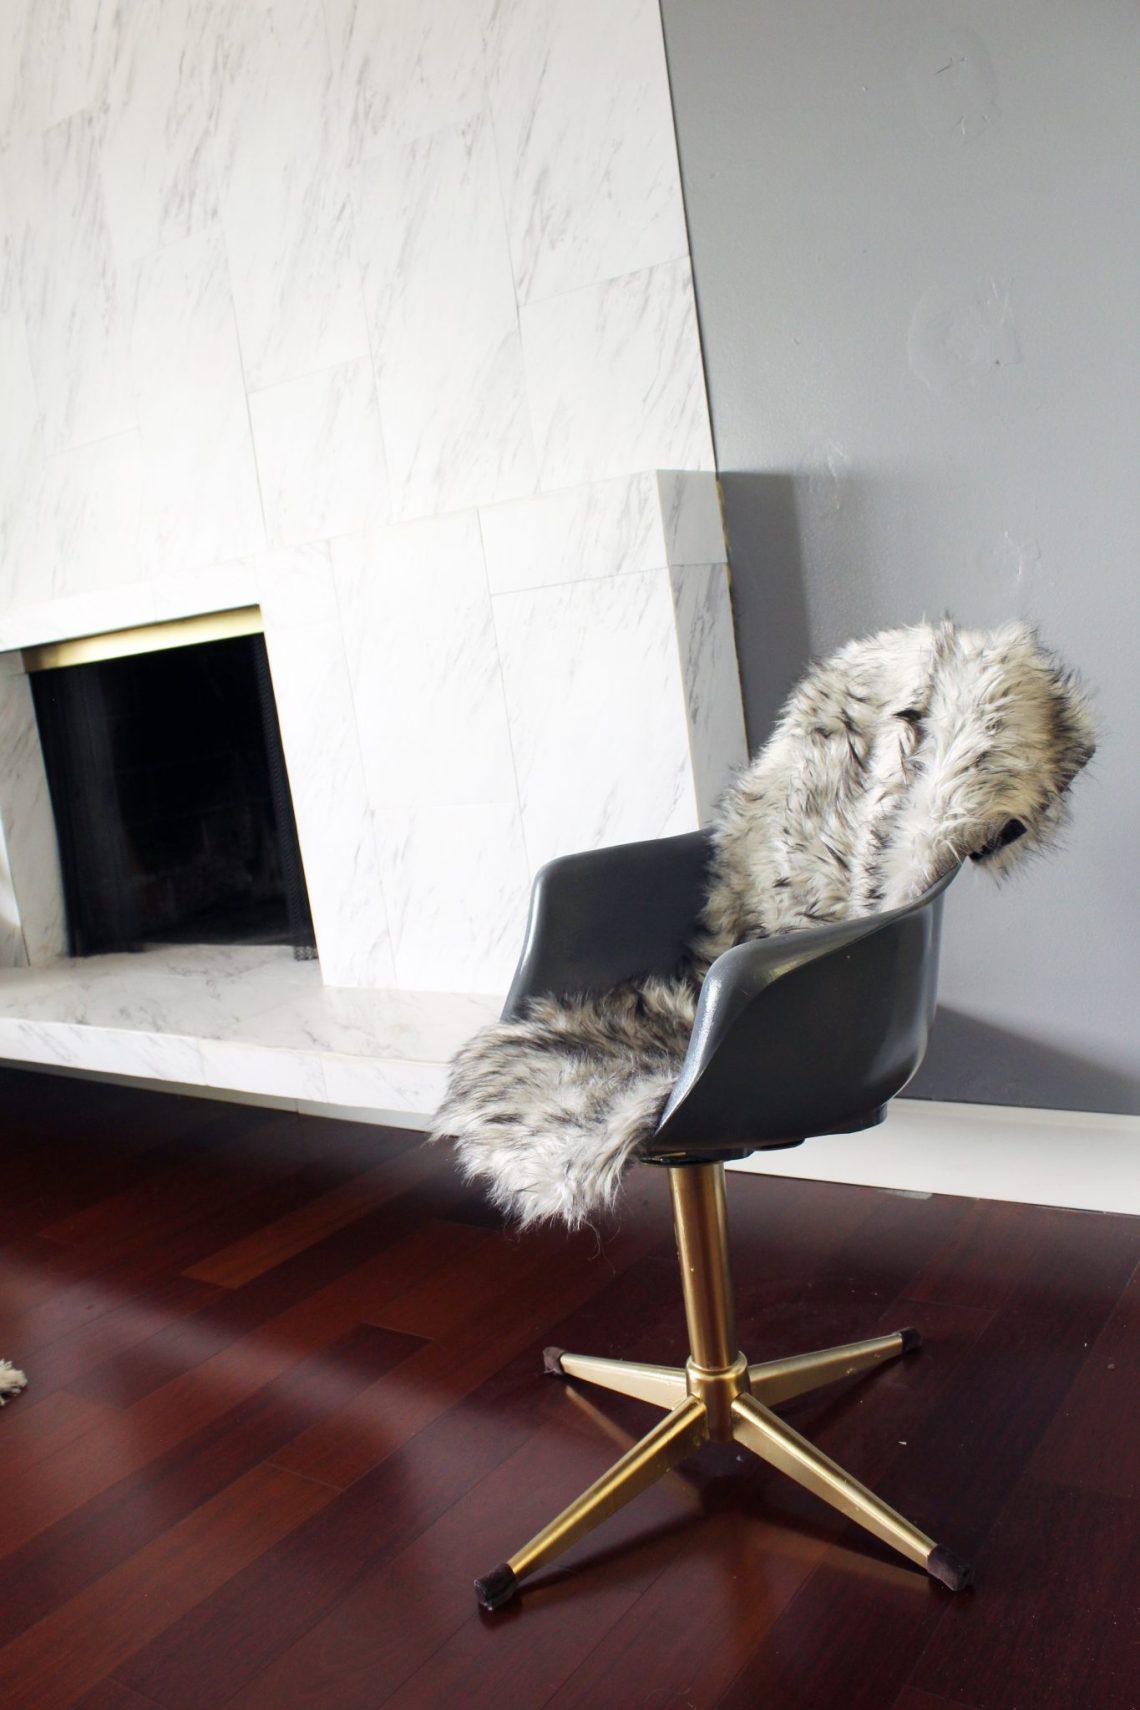 DIY Midcentury Modern Chair Makeover Tutorial